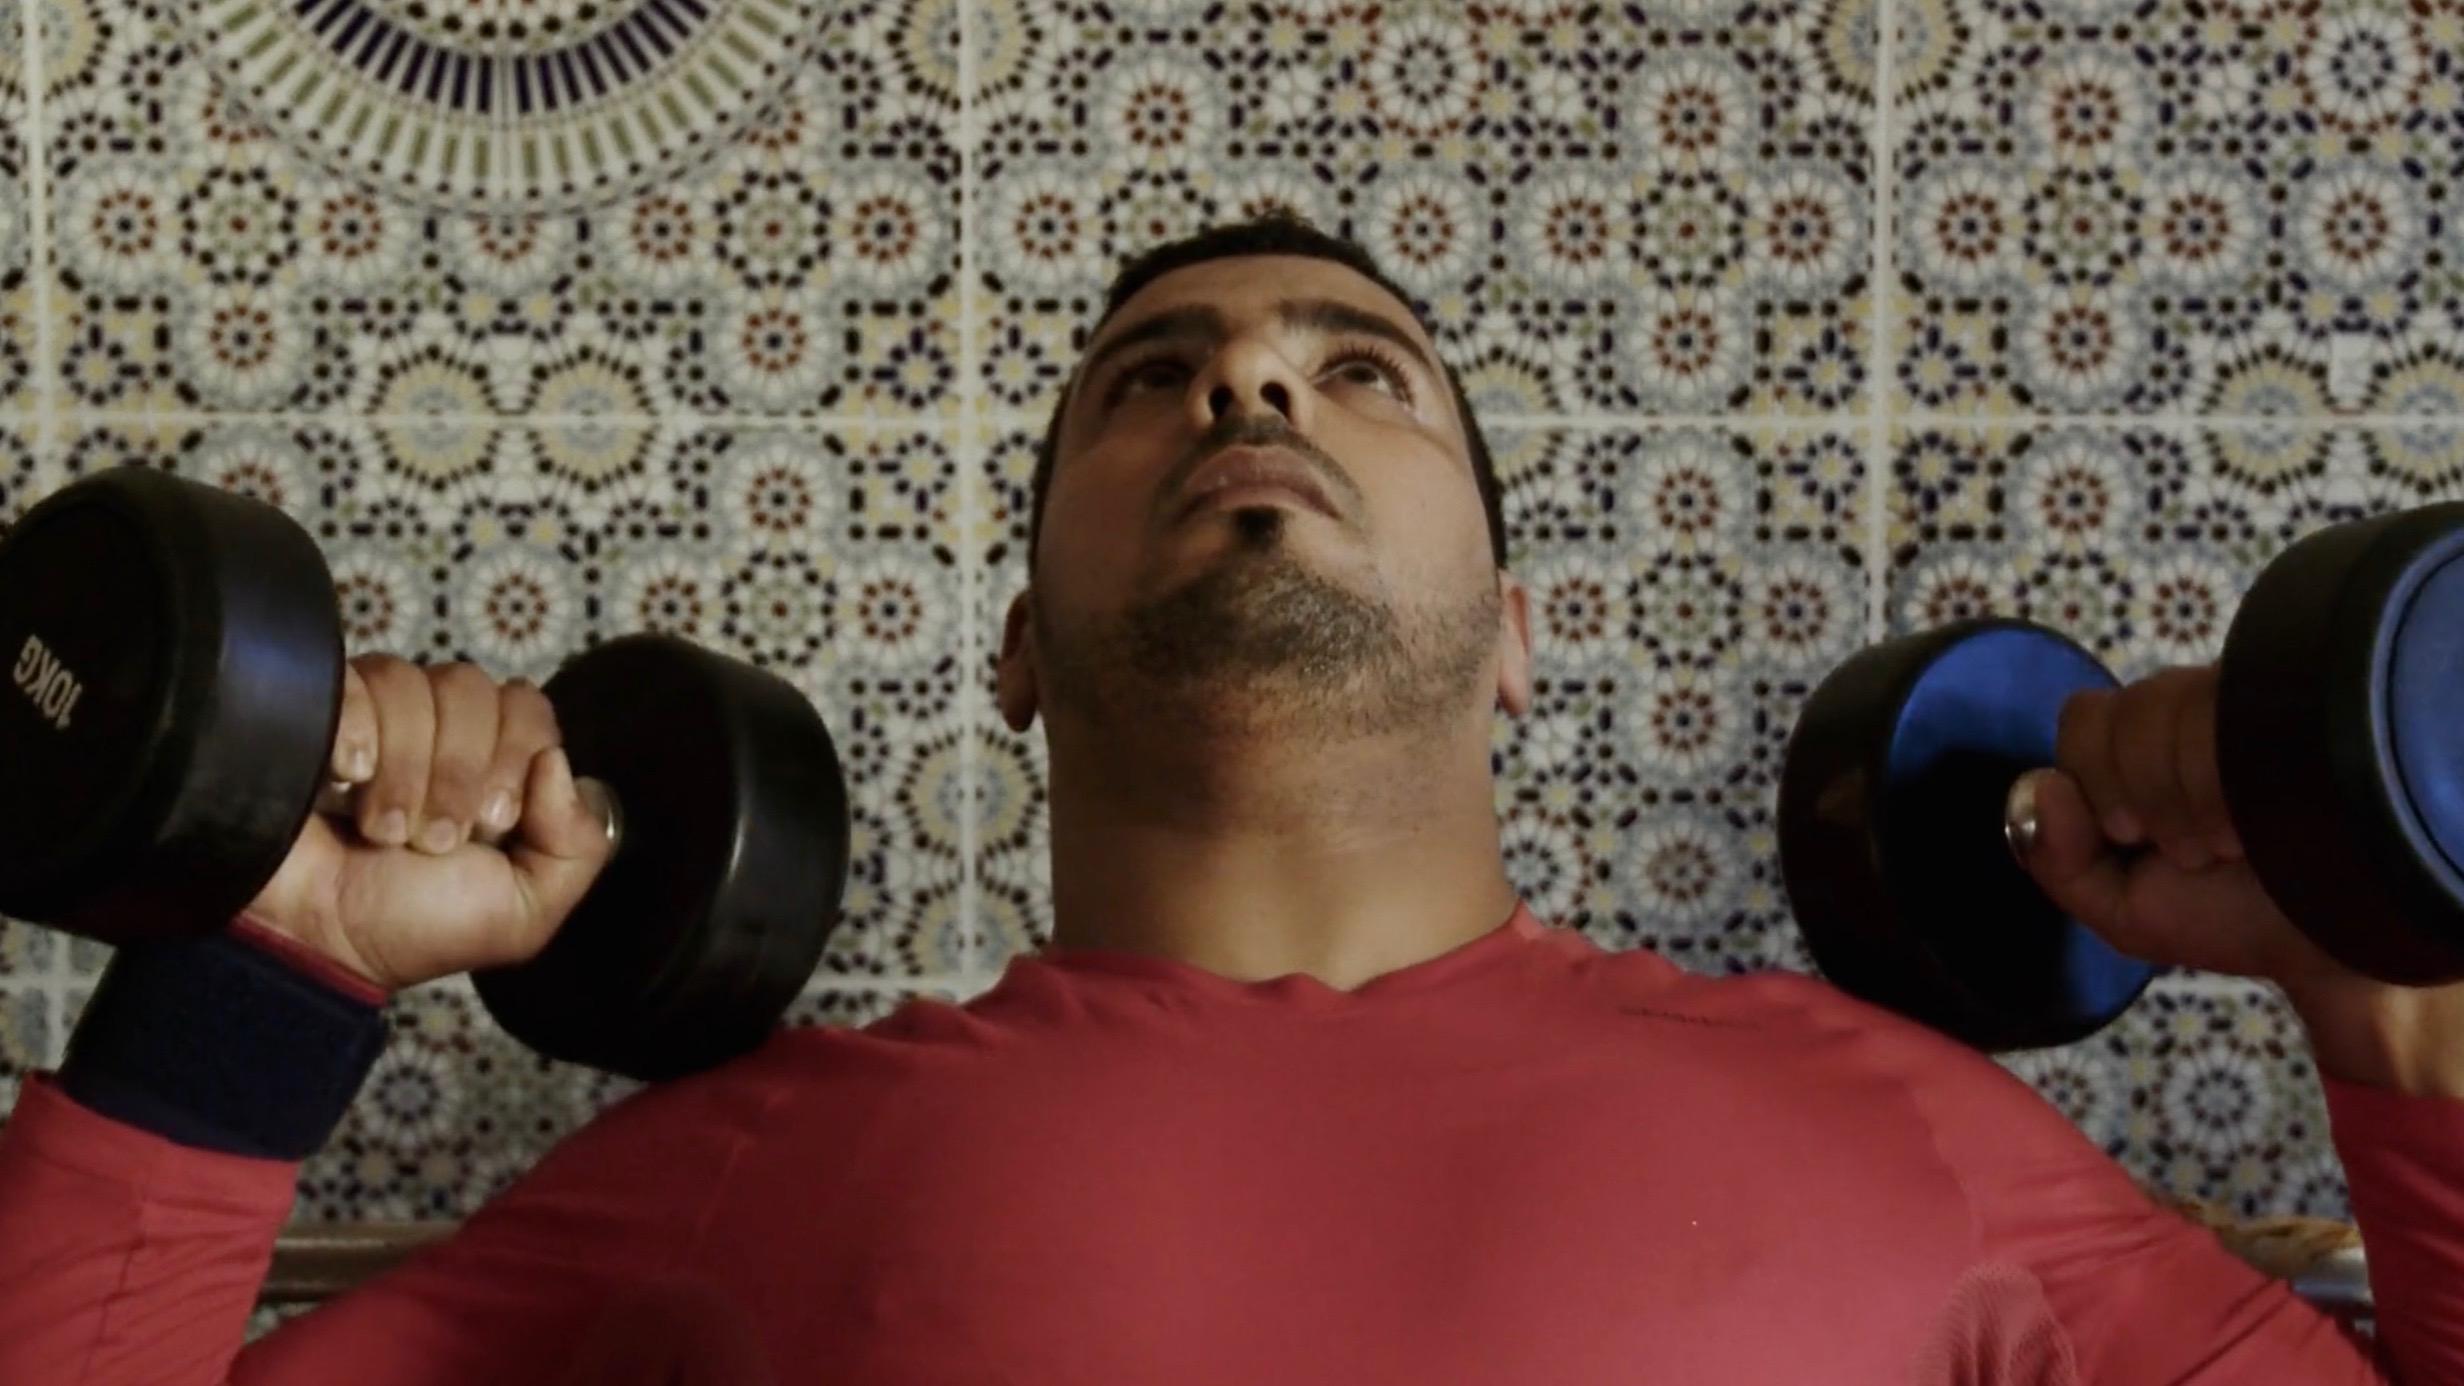 Azzedine training for the Rio Paralympics